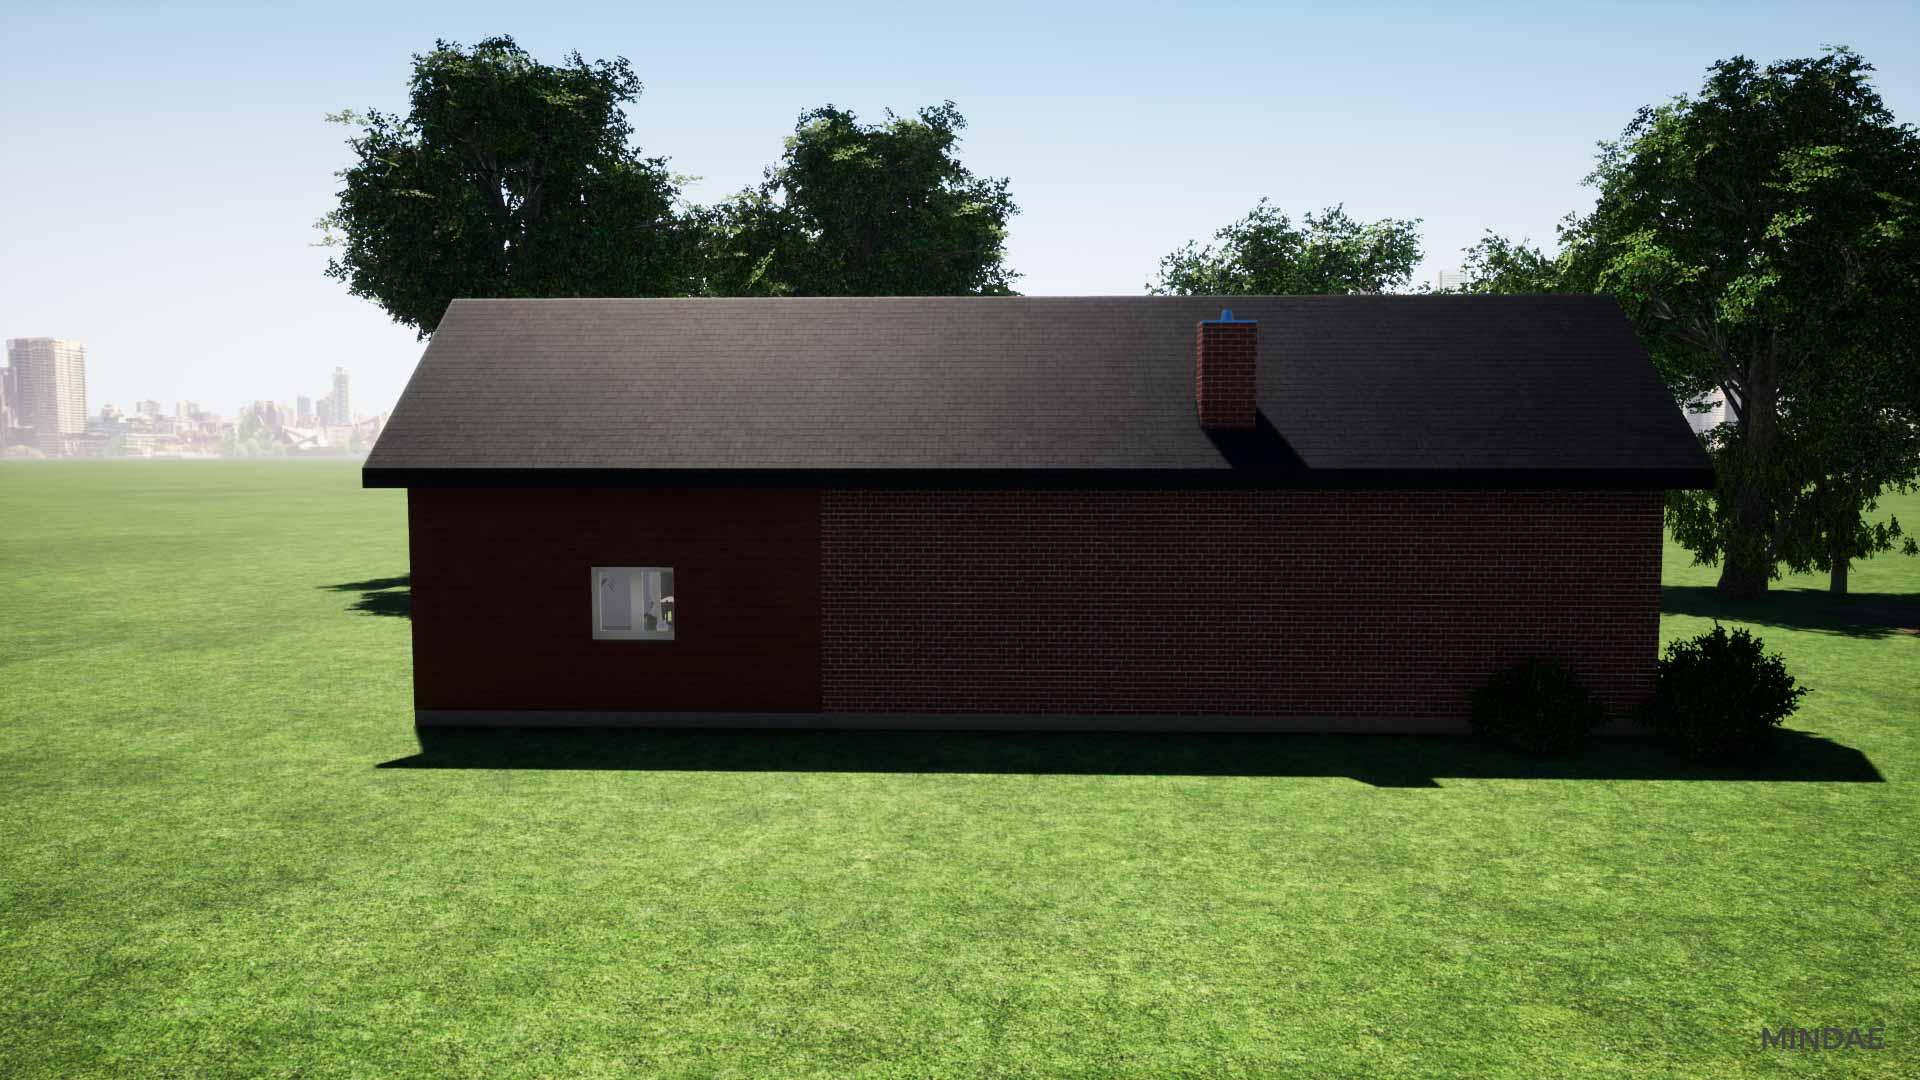 Mindae_3D_maison_extension_bois_Cambremer_terrasse-(5)